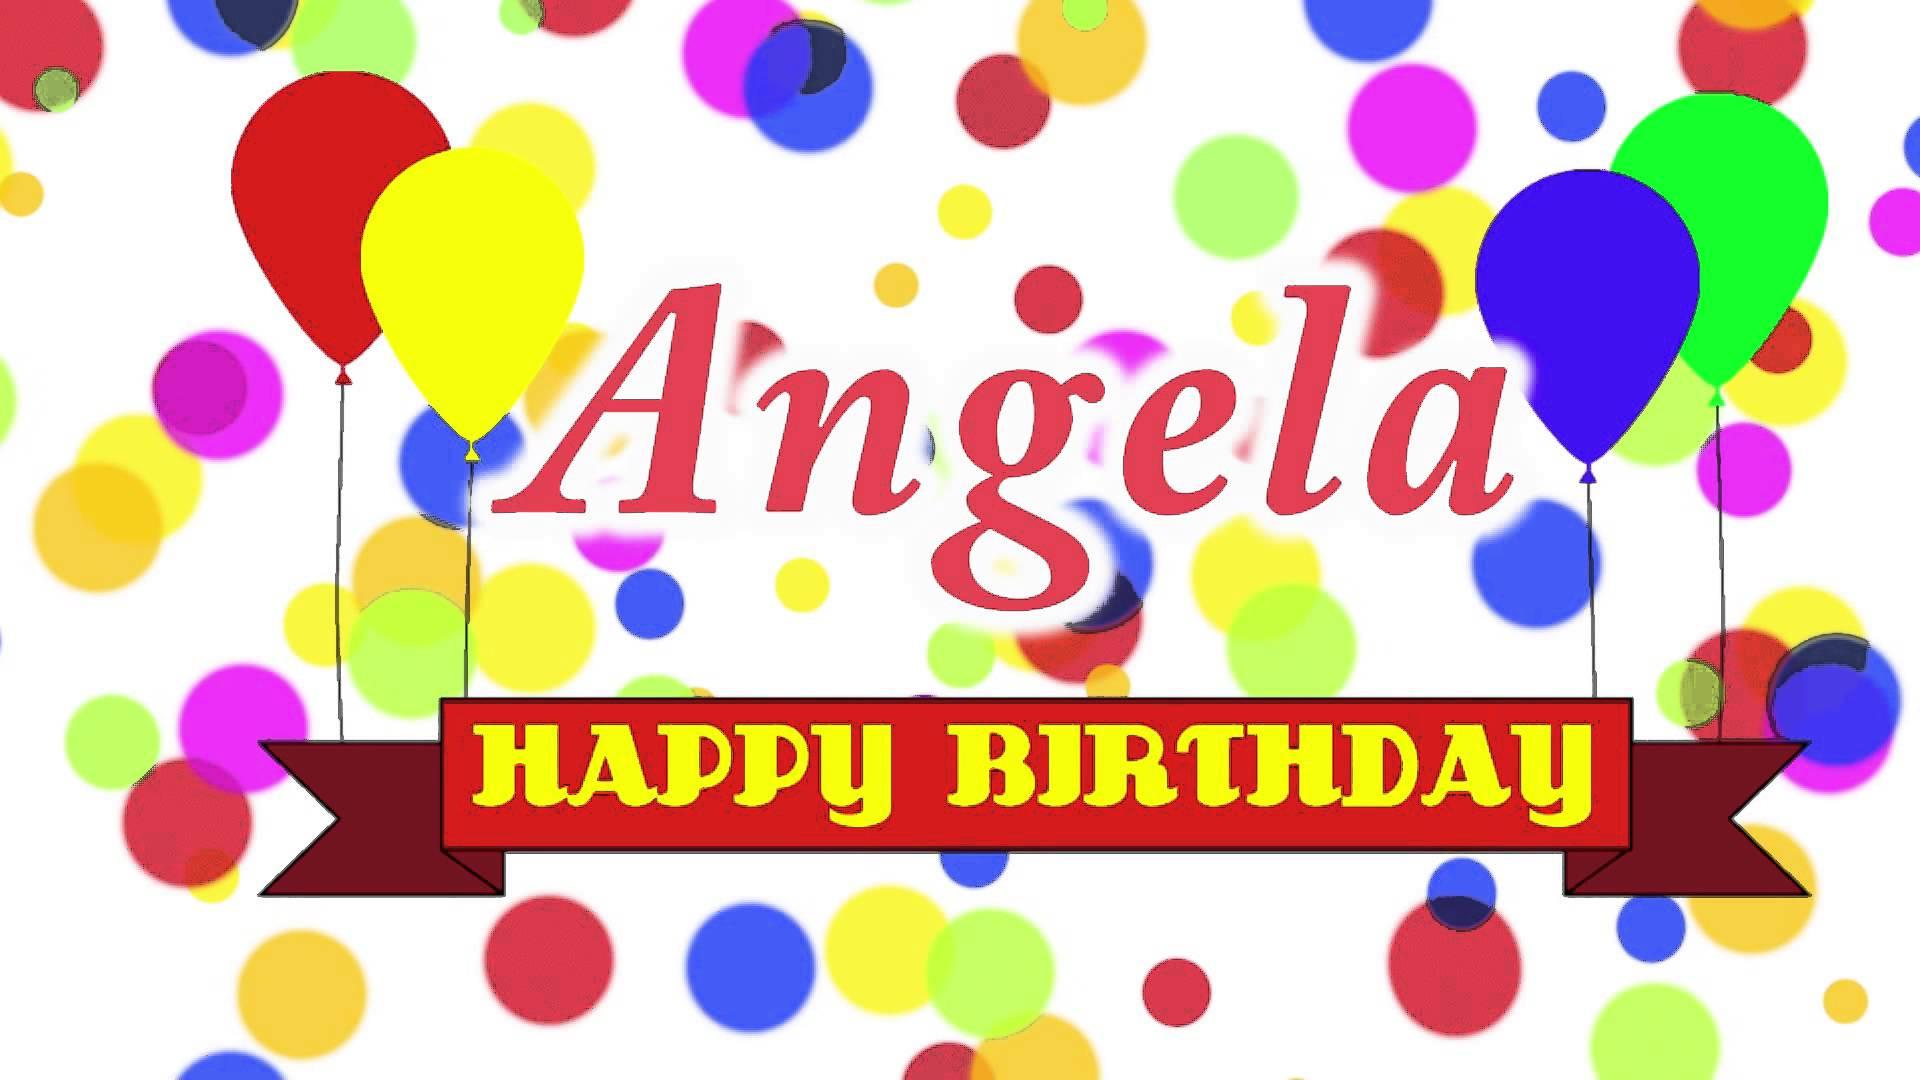 Popular Wallpaper Name Happy Birthday - 922313-free-download-happy-birthday-wallpapers-with-name-1920x1080-free-download  Image_467382.jpg